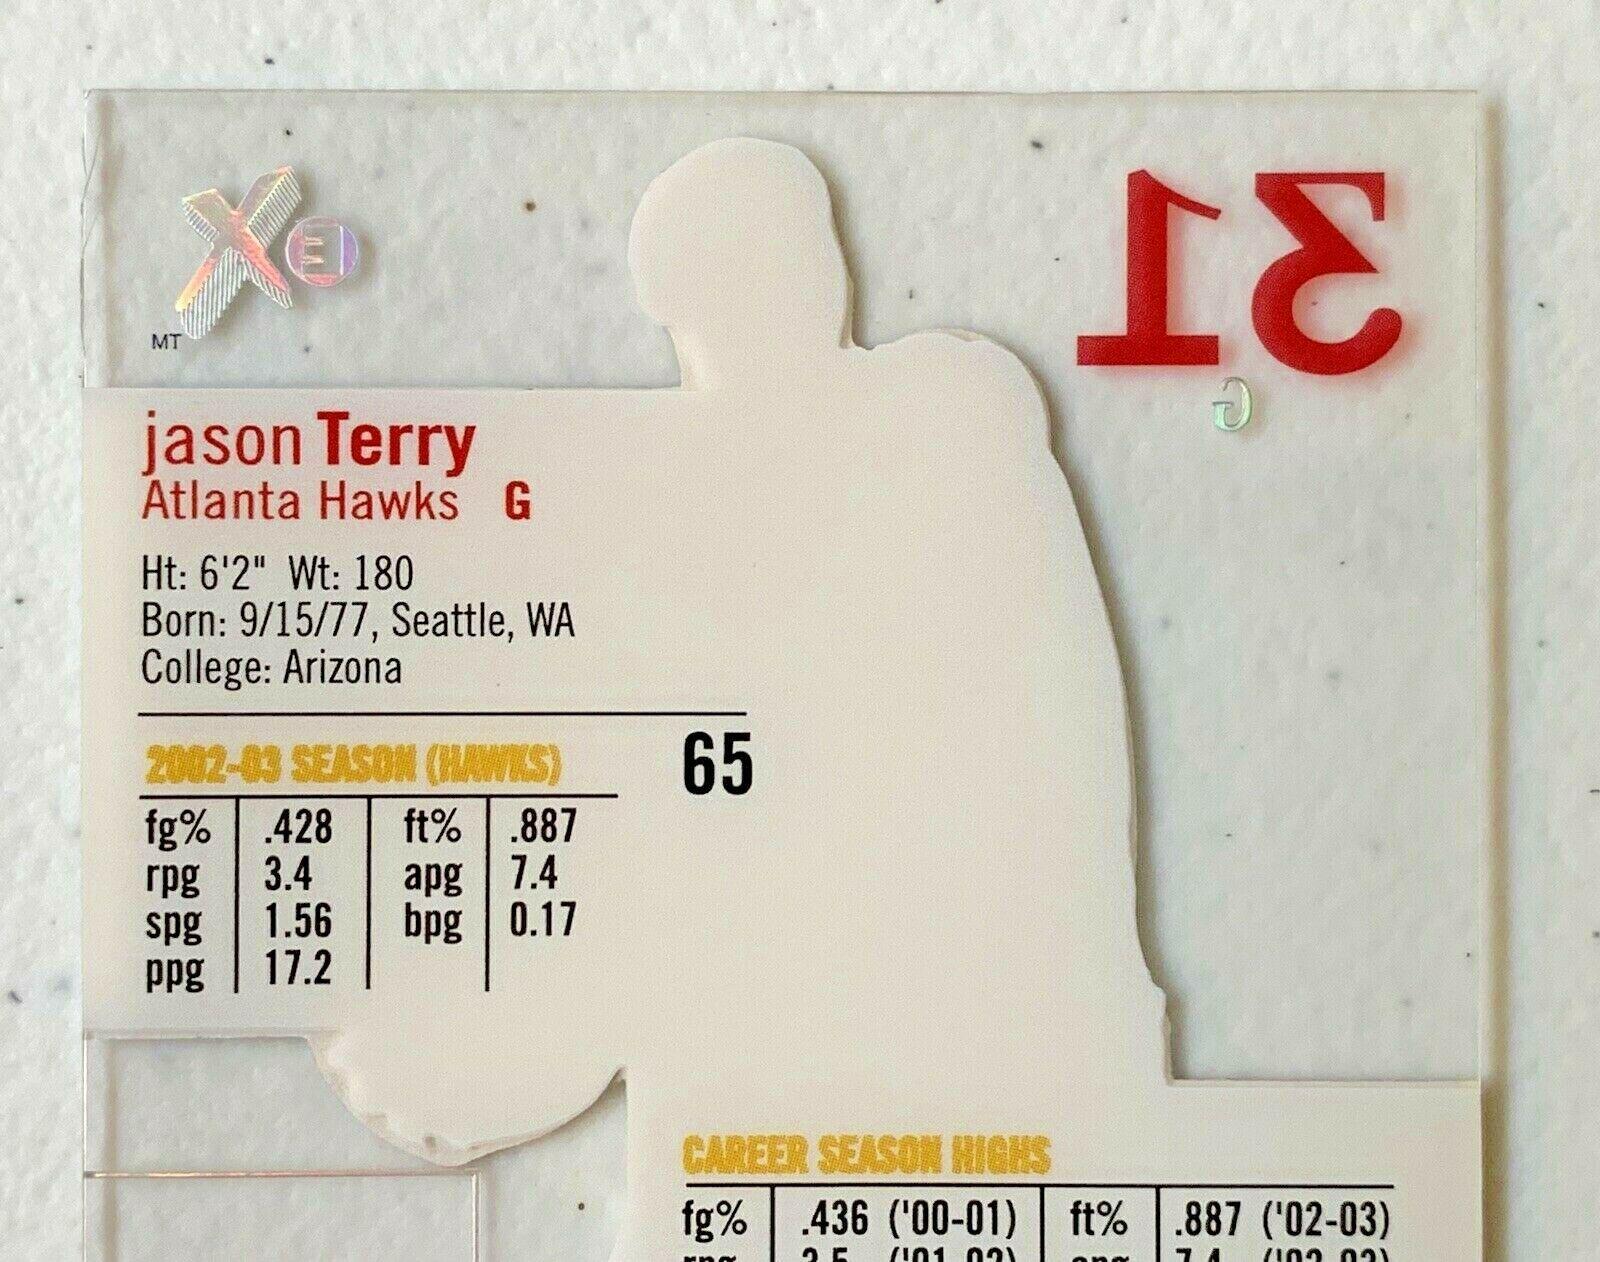 Jason Terry Now/66 #65 Atlanta Hawks Fleer Basketball Card with Hard Case 31G image 8